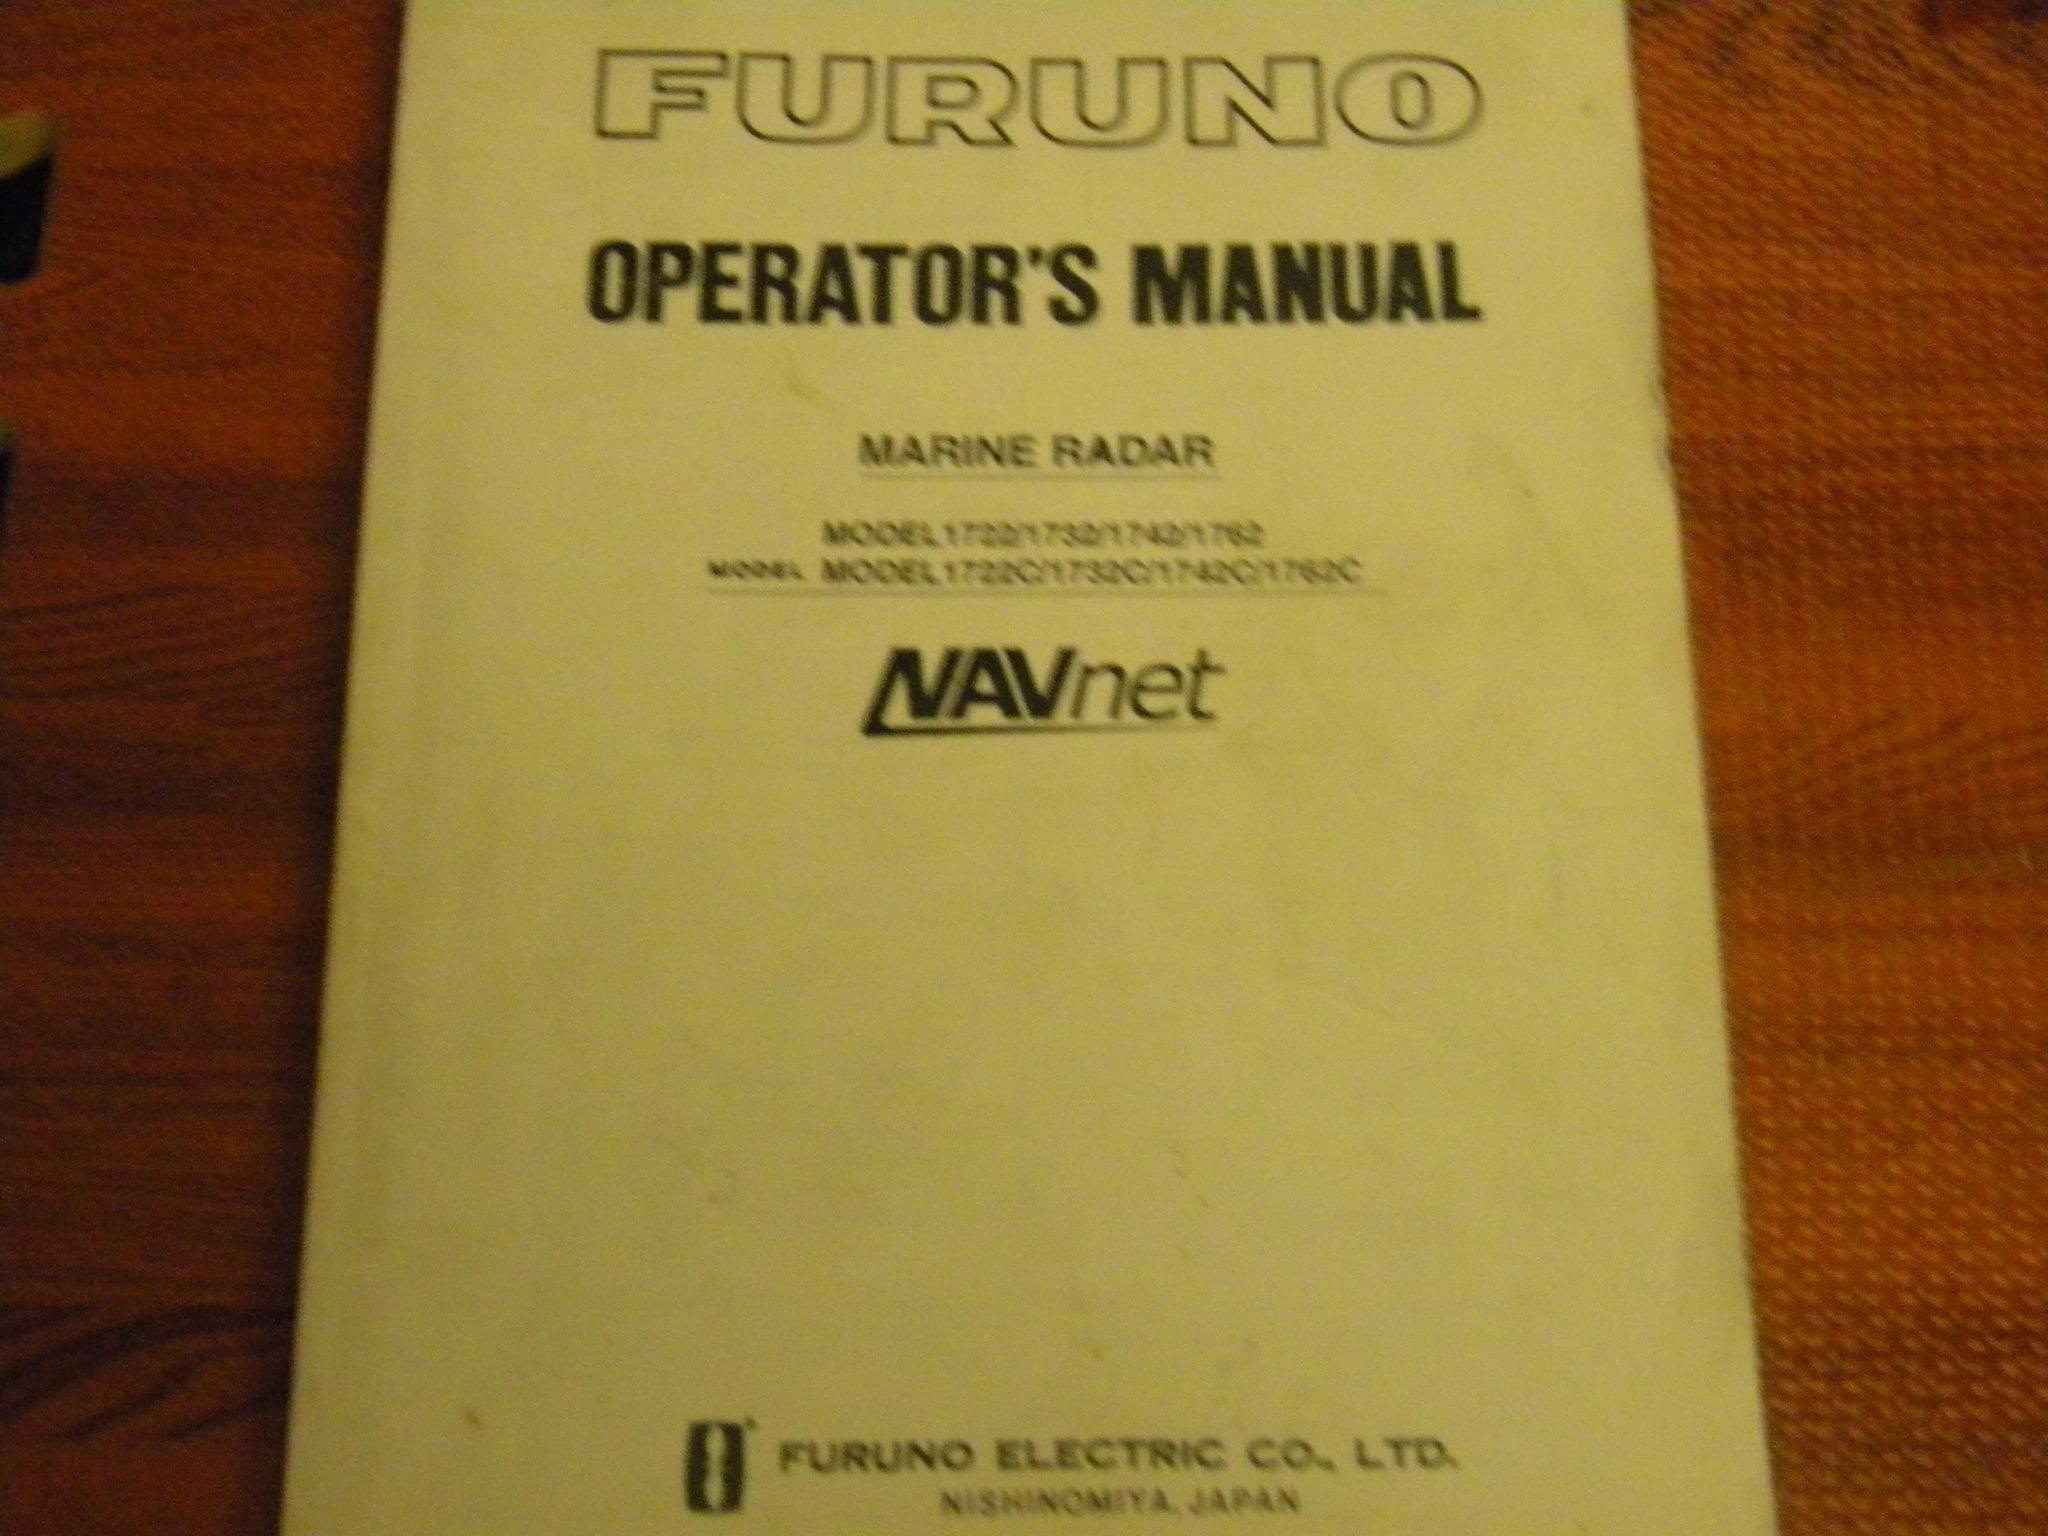 furuno radar operators manual model 1722 1732 1742 1762 1722c 1732c rh maxmarineelectronics com